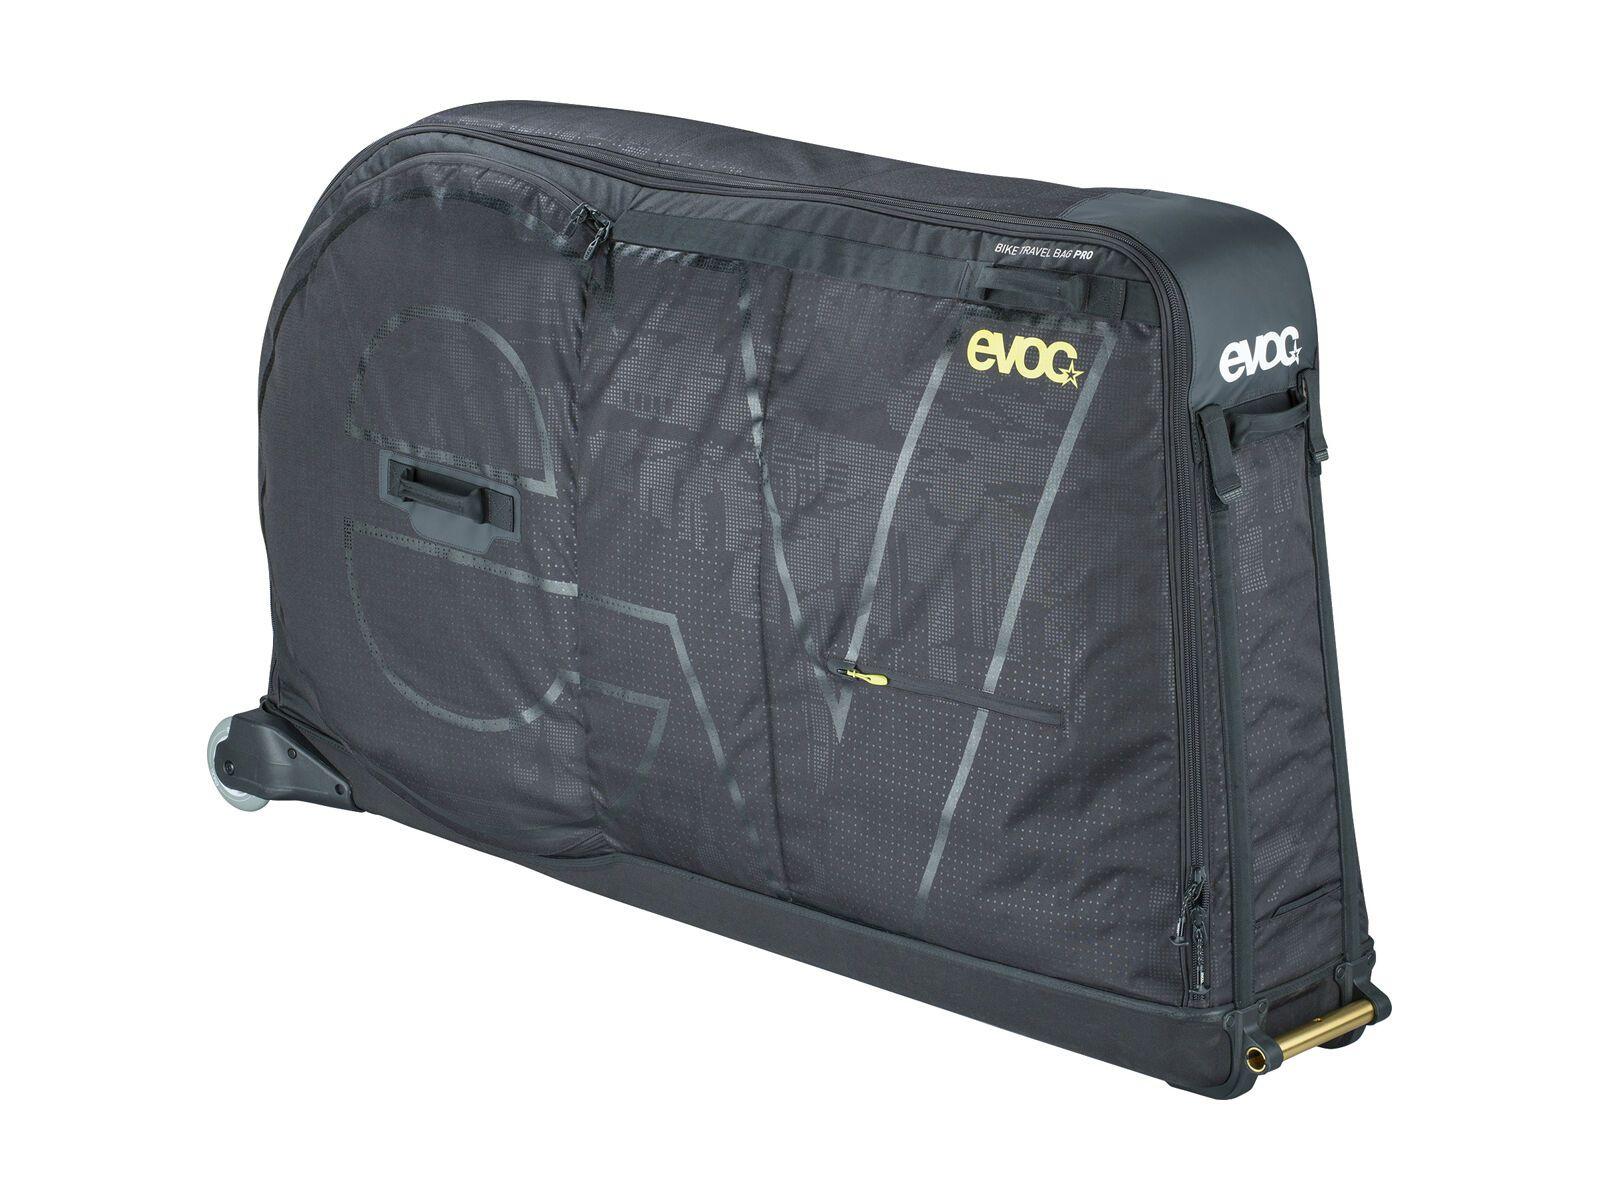 Evoc Bike Travel Bag Pro 310l, black - Fahrradtransporttasche 450720997